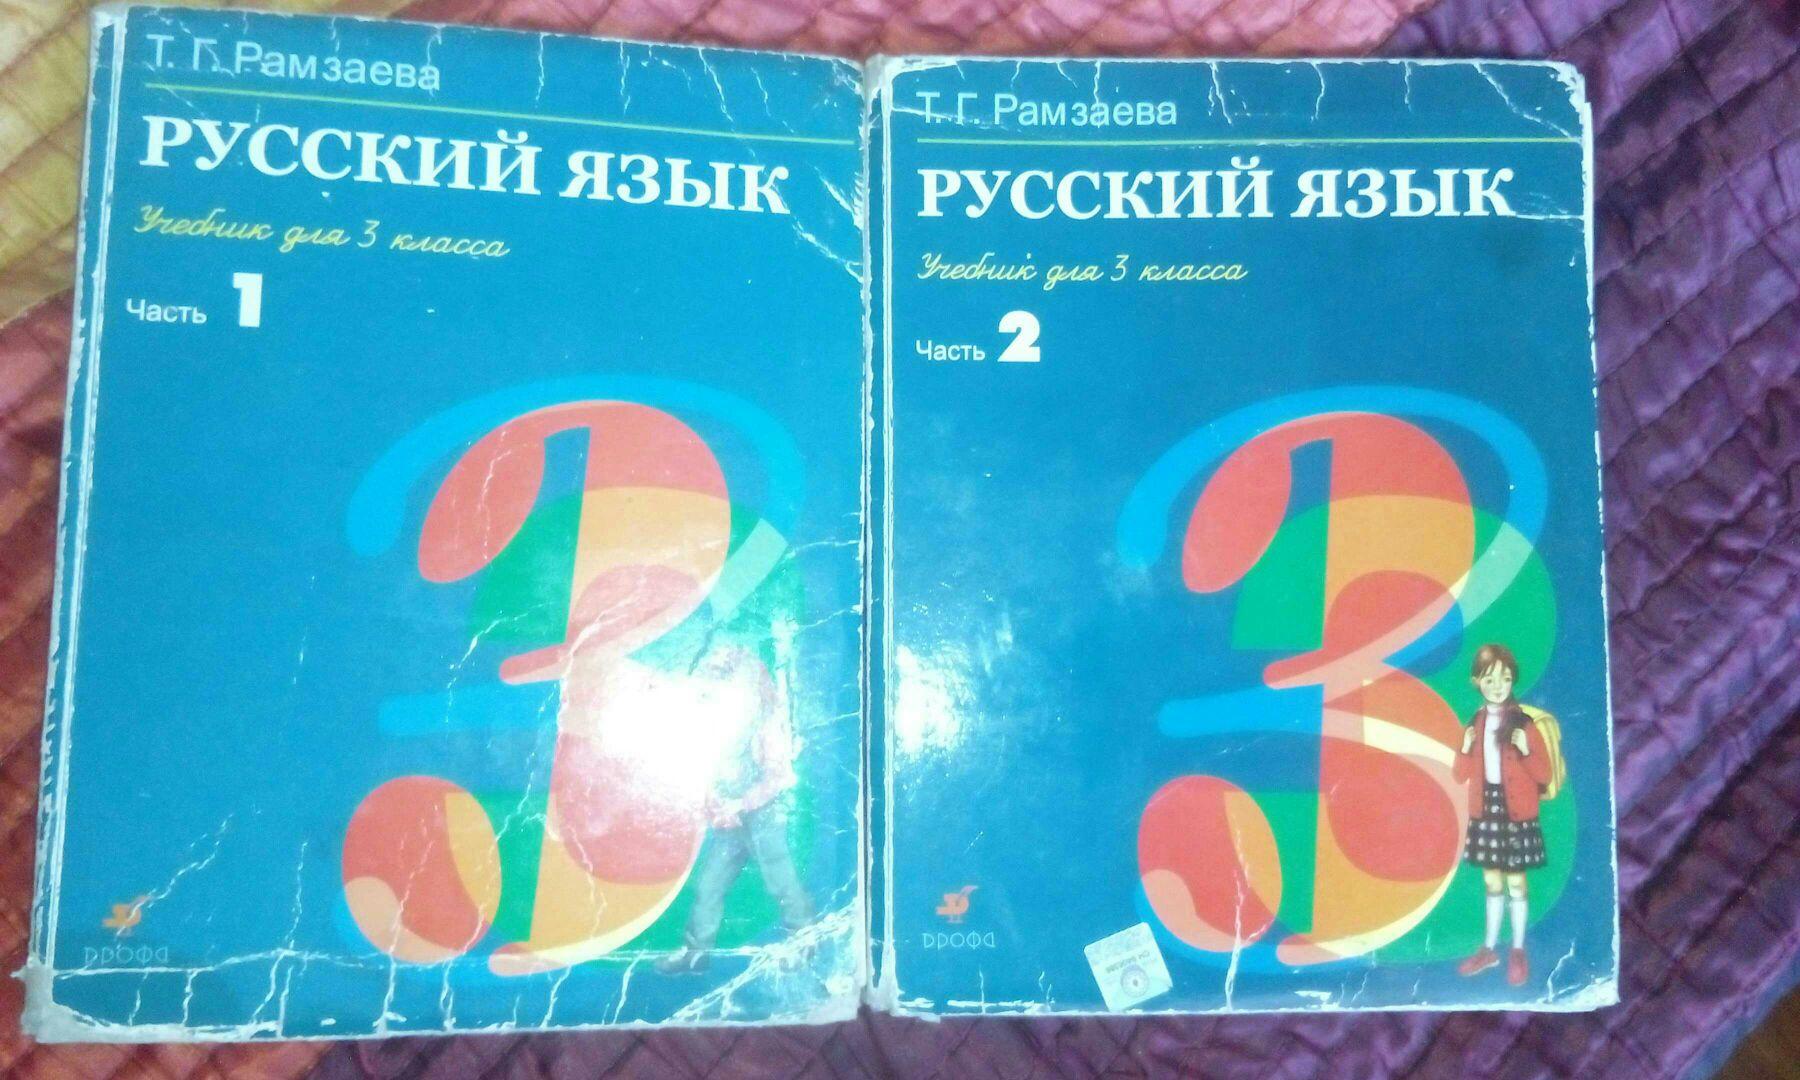 0be9c1791b36dede52e55237c1632537.jpg